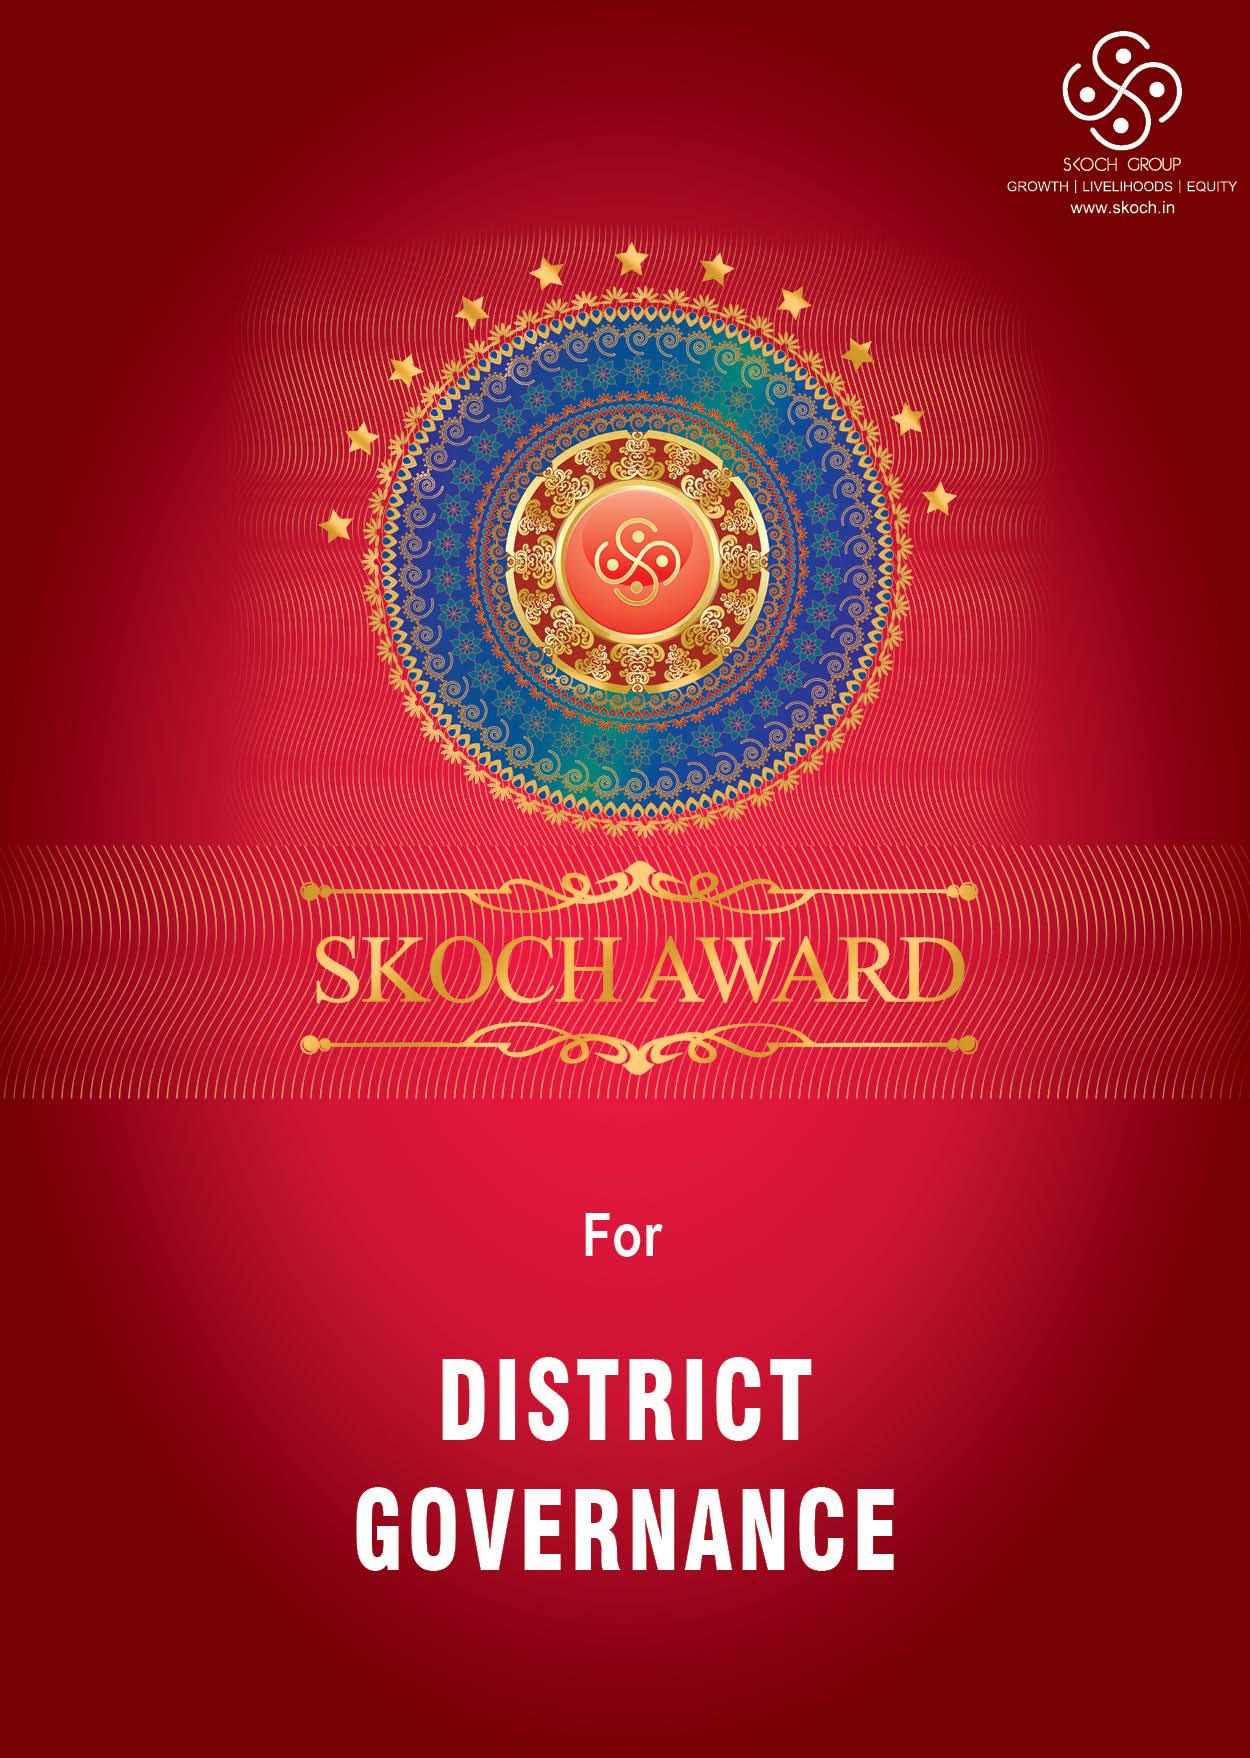 District Governance